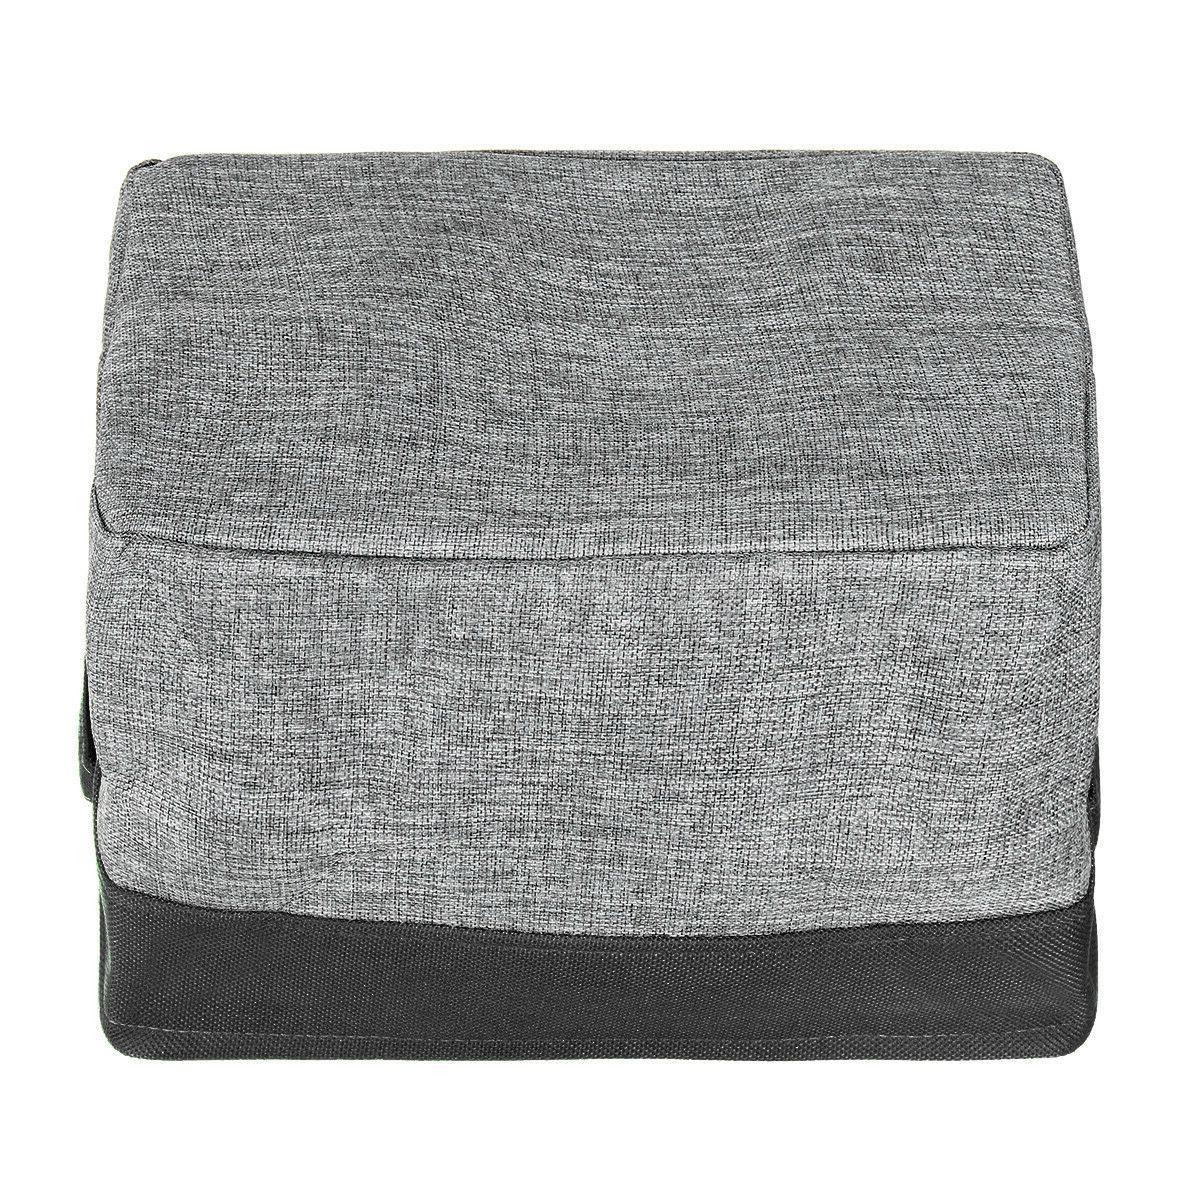 Foldable Clothes Basket Bag Organizer